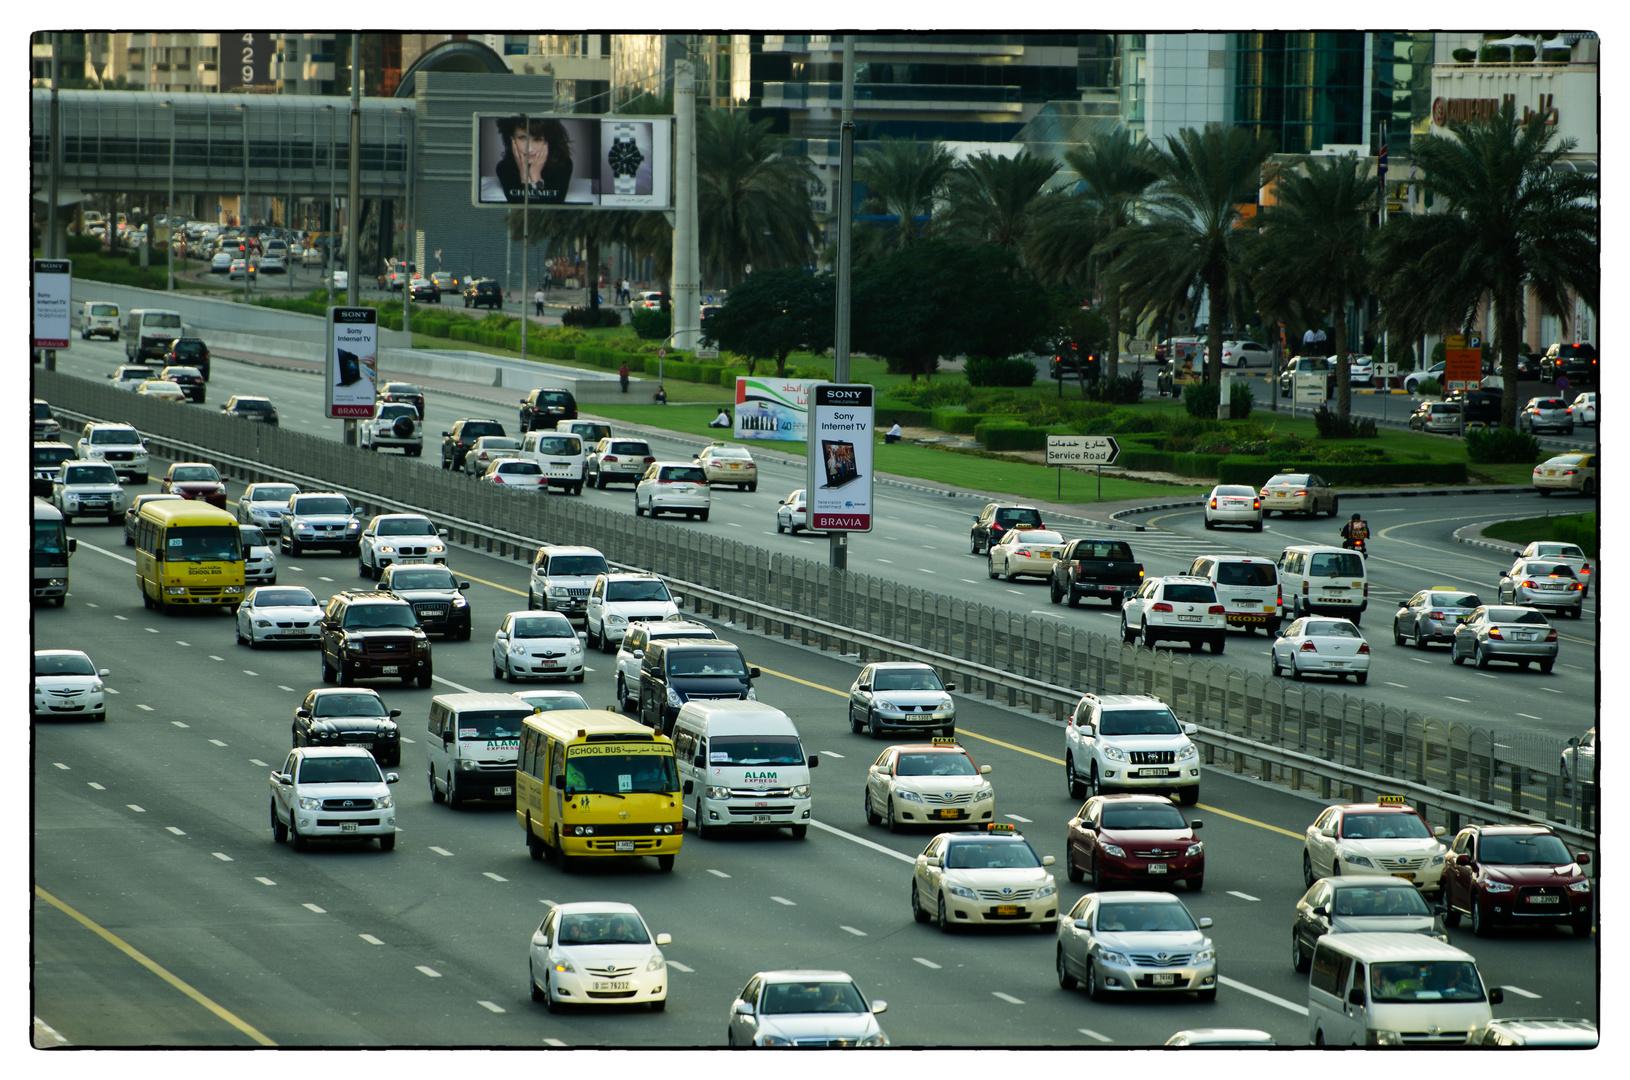 Dubai - Sheikh Zayed Road - busy as usual